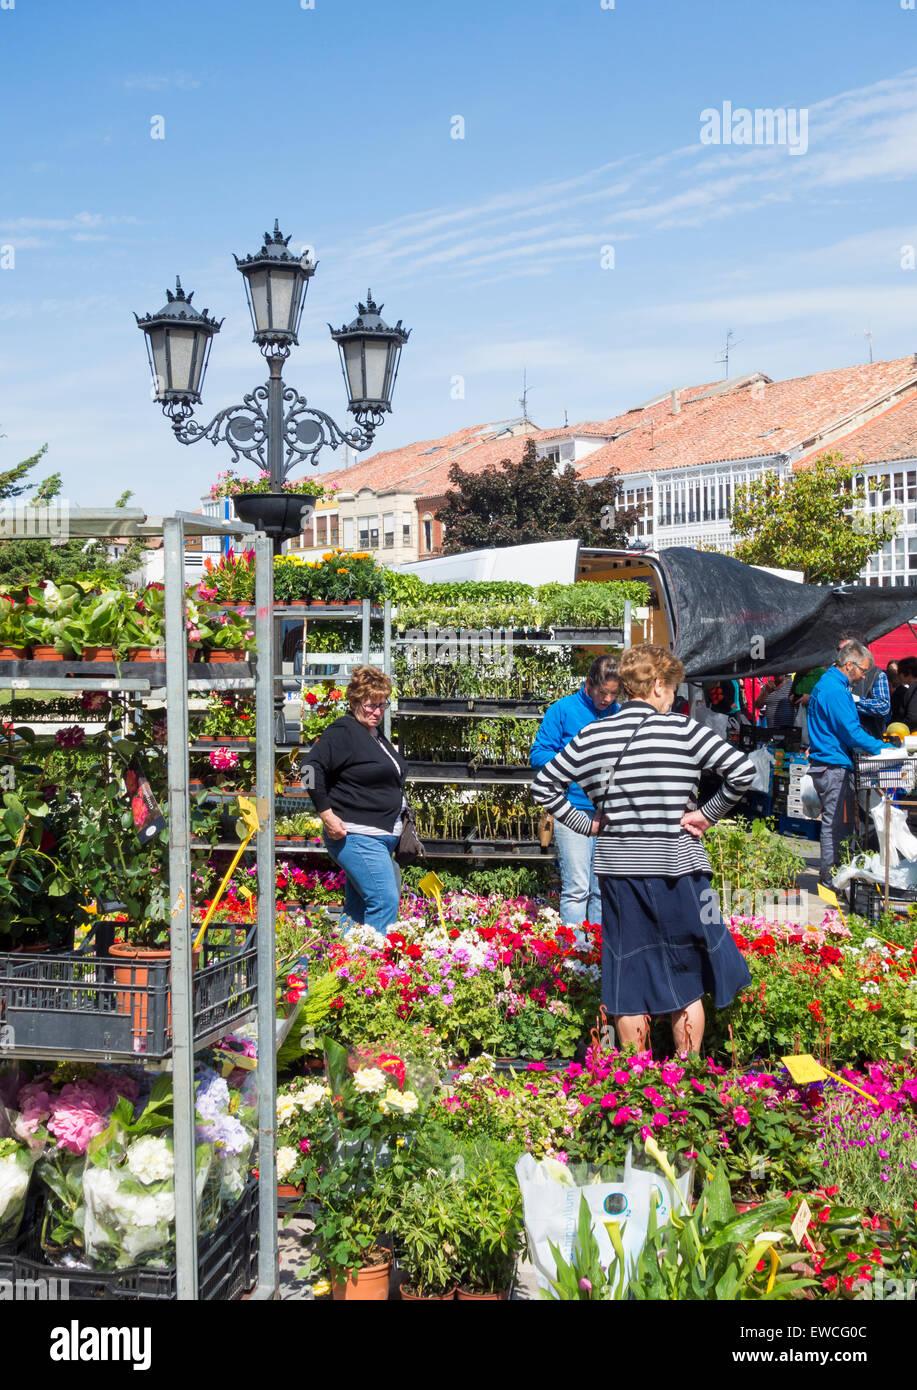 Weekly market in Aguilar de Campoo, Palencia province, Spain - Stock Image